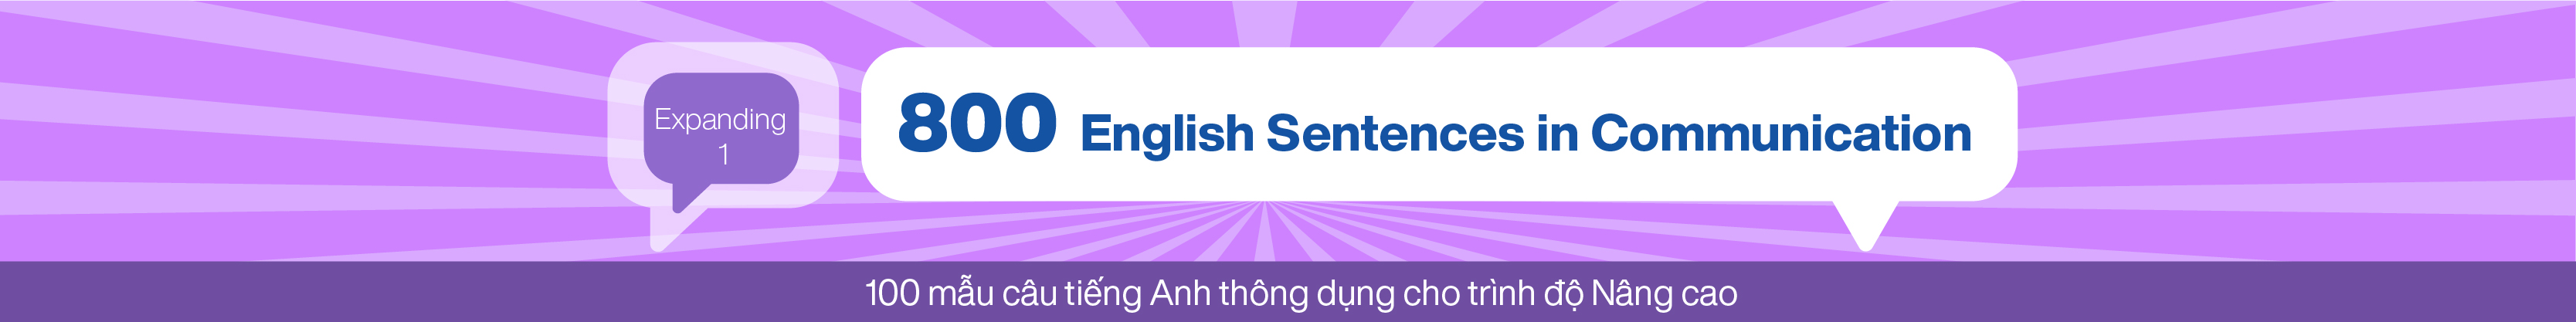 800 English Sentences in Communication (Expanding 1) banner